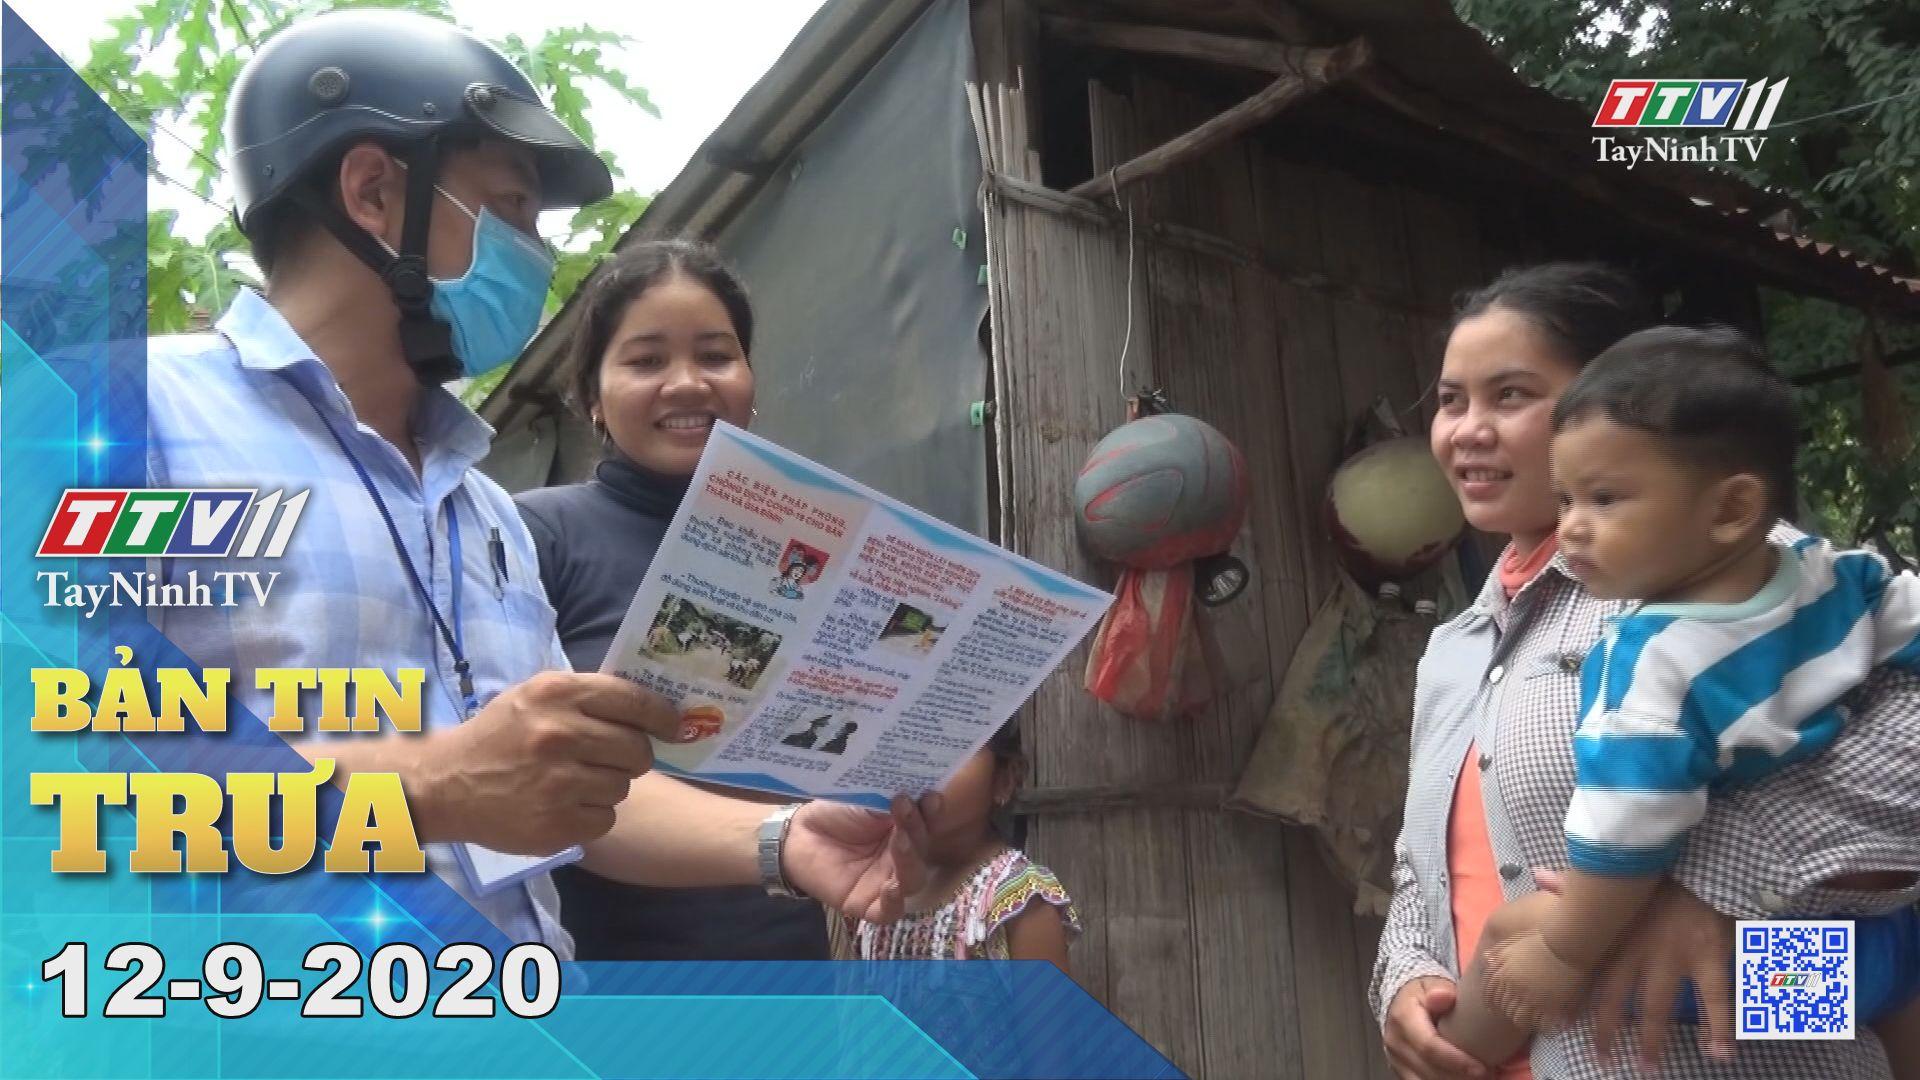 Bản tin trưa 12-9-2020 | Tin tức hôm nay | TayNinhTV